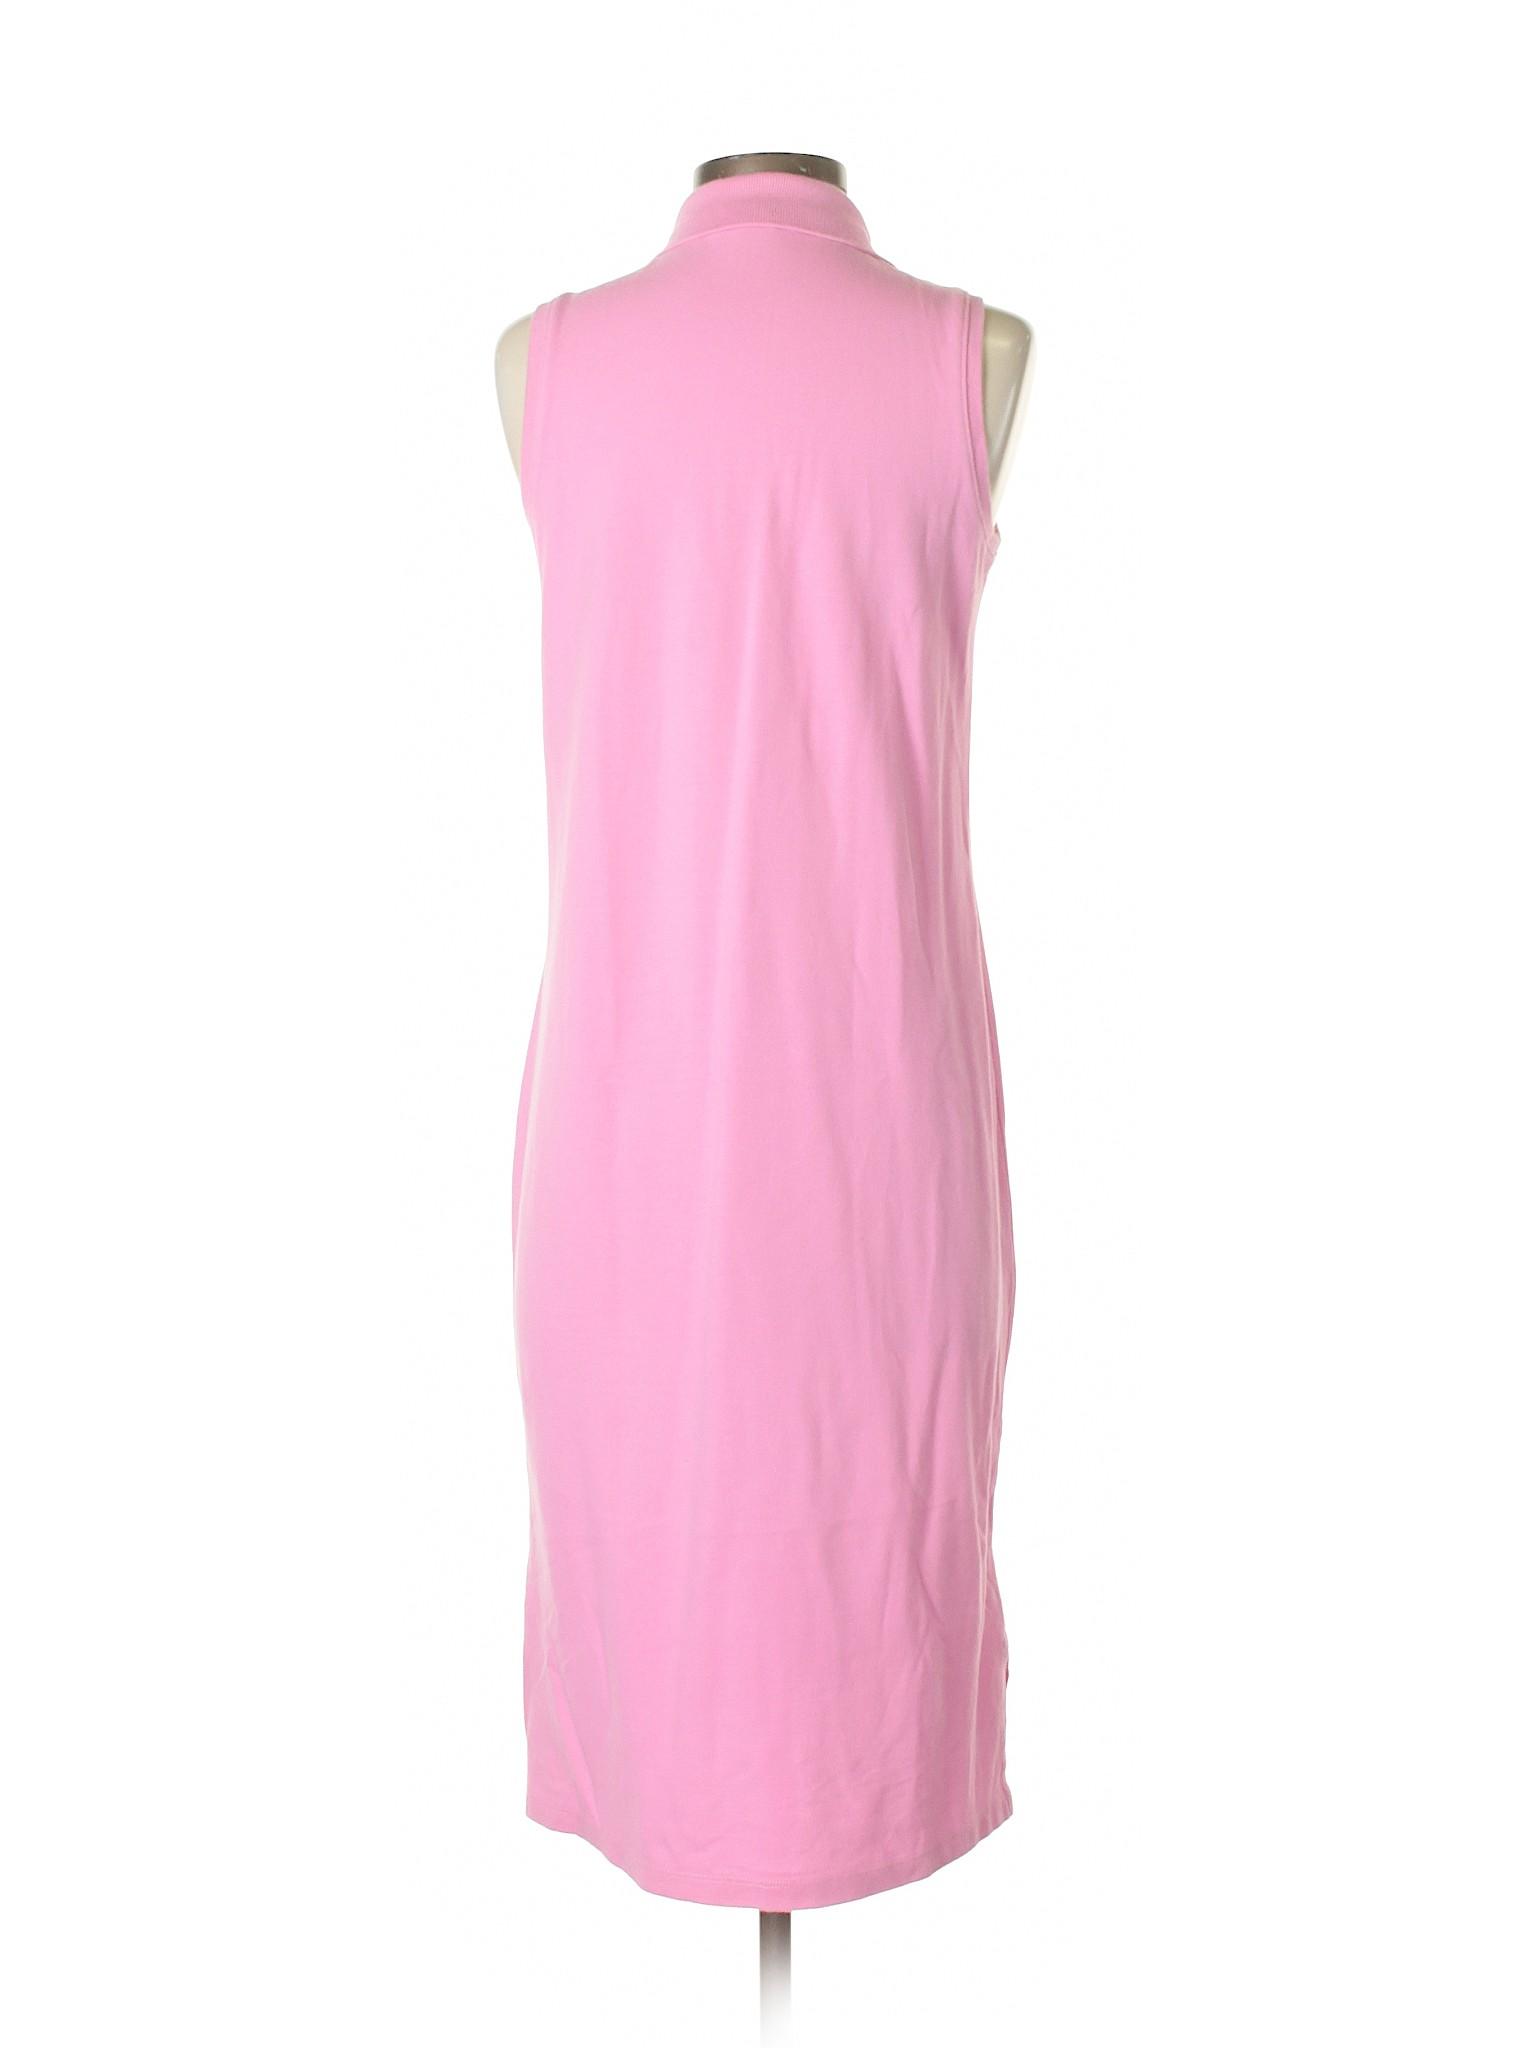 Dress Dress Lauren Lauren Selling Selling Ralph Selling Casual Casual Ralph Dress Ralph Lauren Selling Casual wqYpf4X